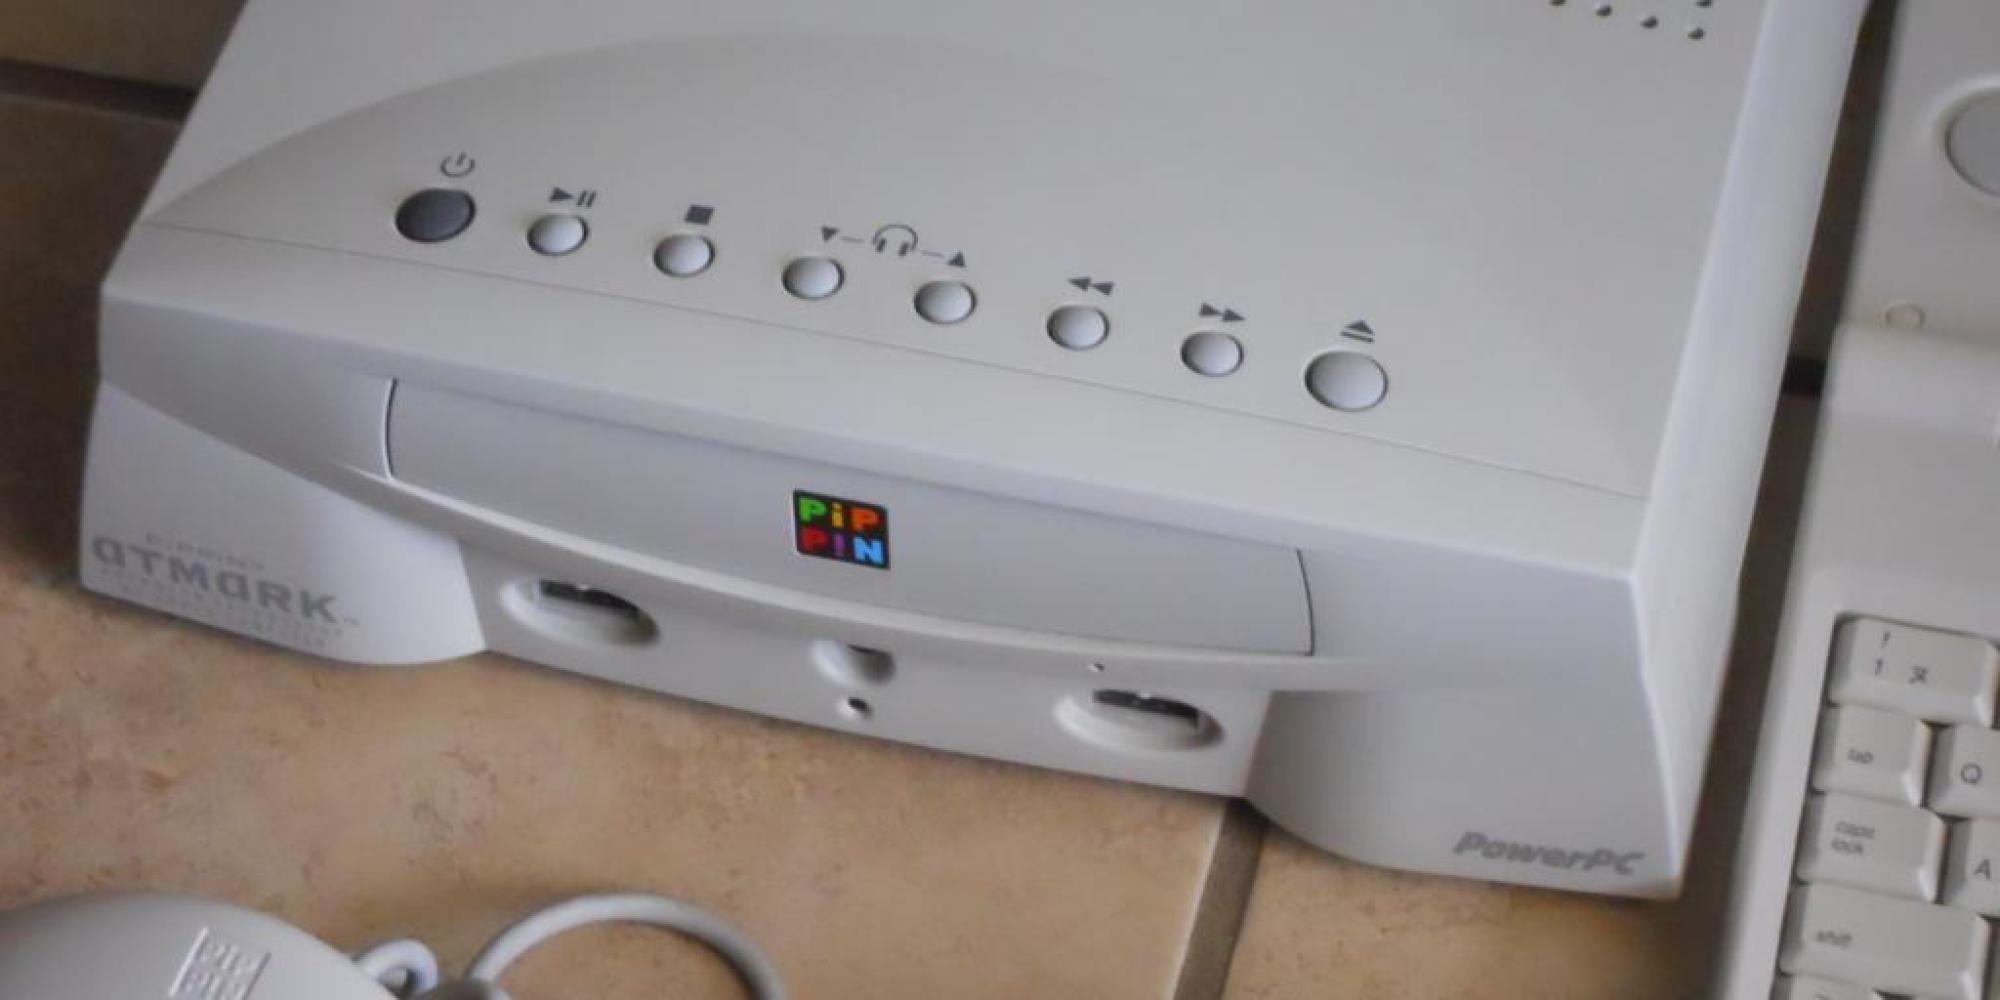 Apple أطلقت جهاز ألعاب فيديو في 1996.. تعرَّف على قصة فشله الذريع